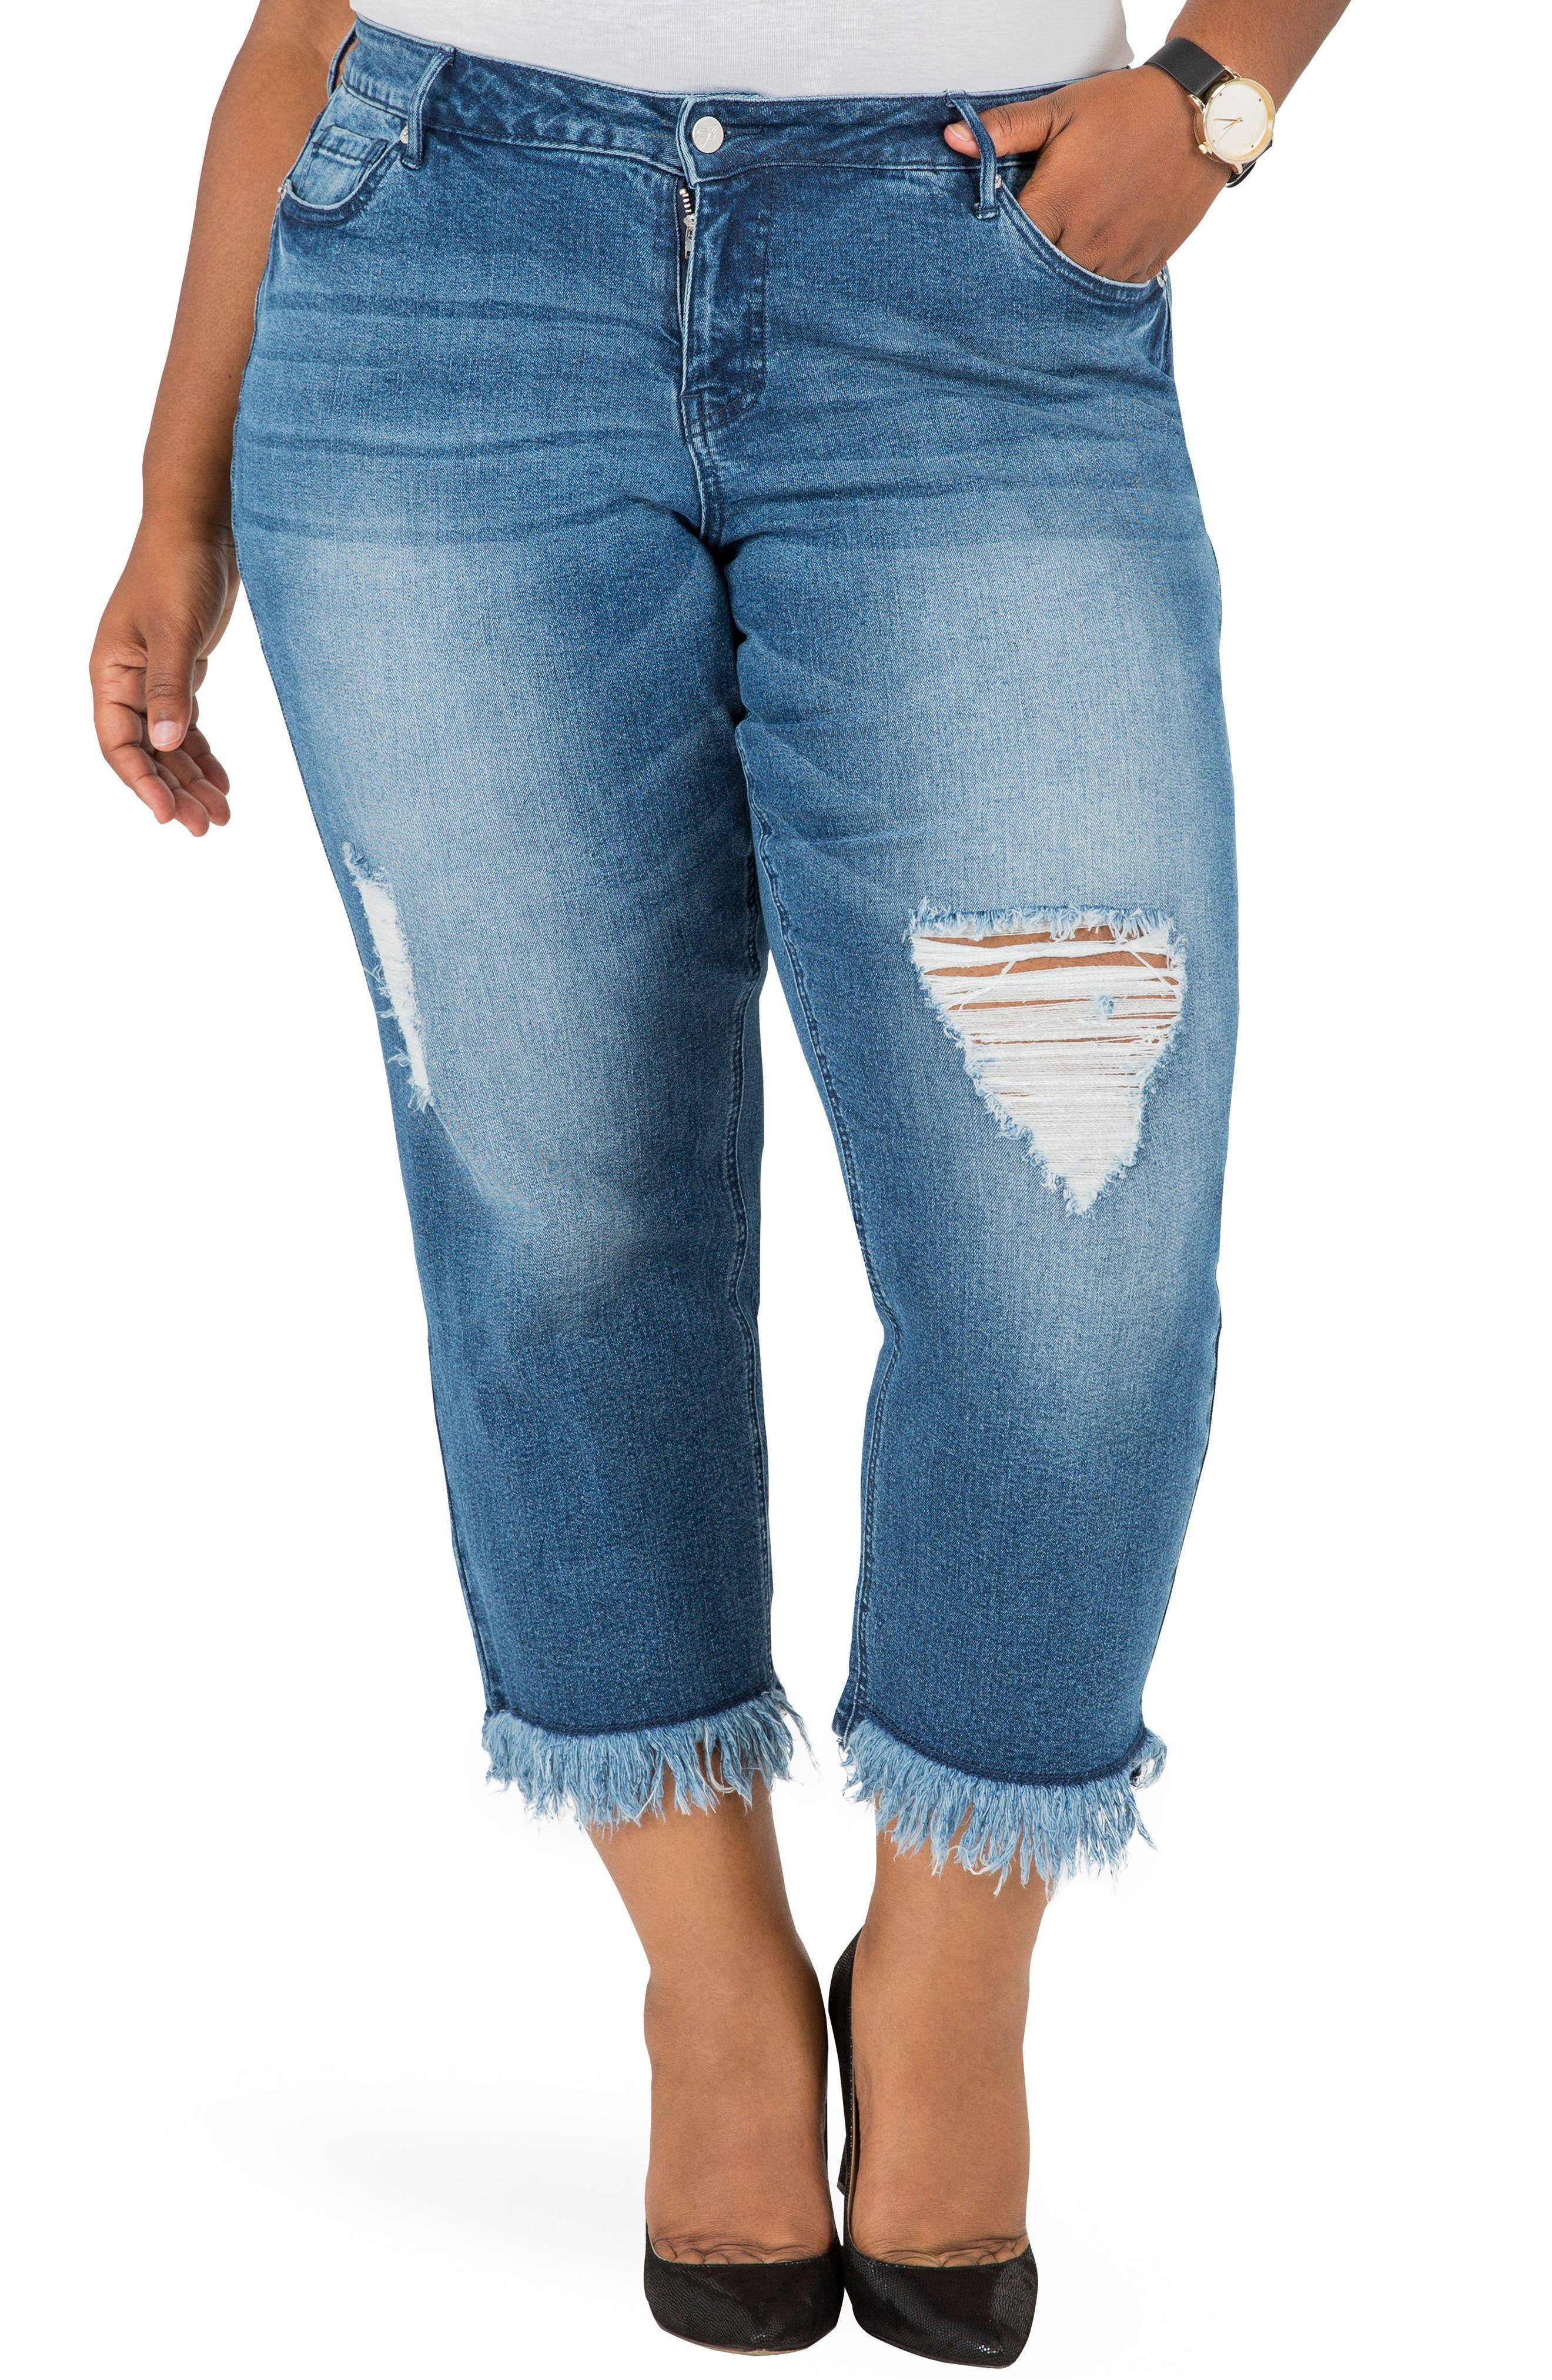 Verla Frayed Hem Crop Boyfriend Jeans,                         Main,                         color, Light Blue